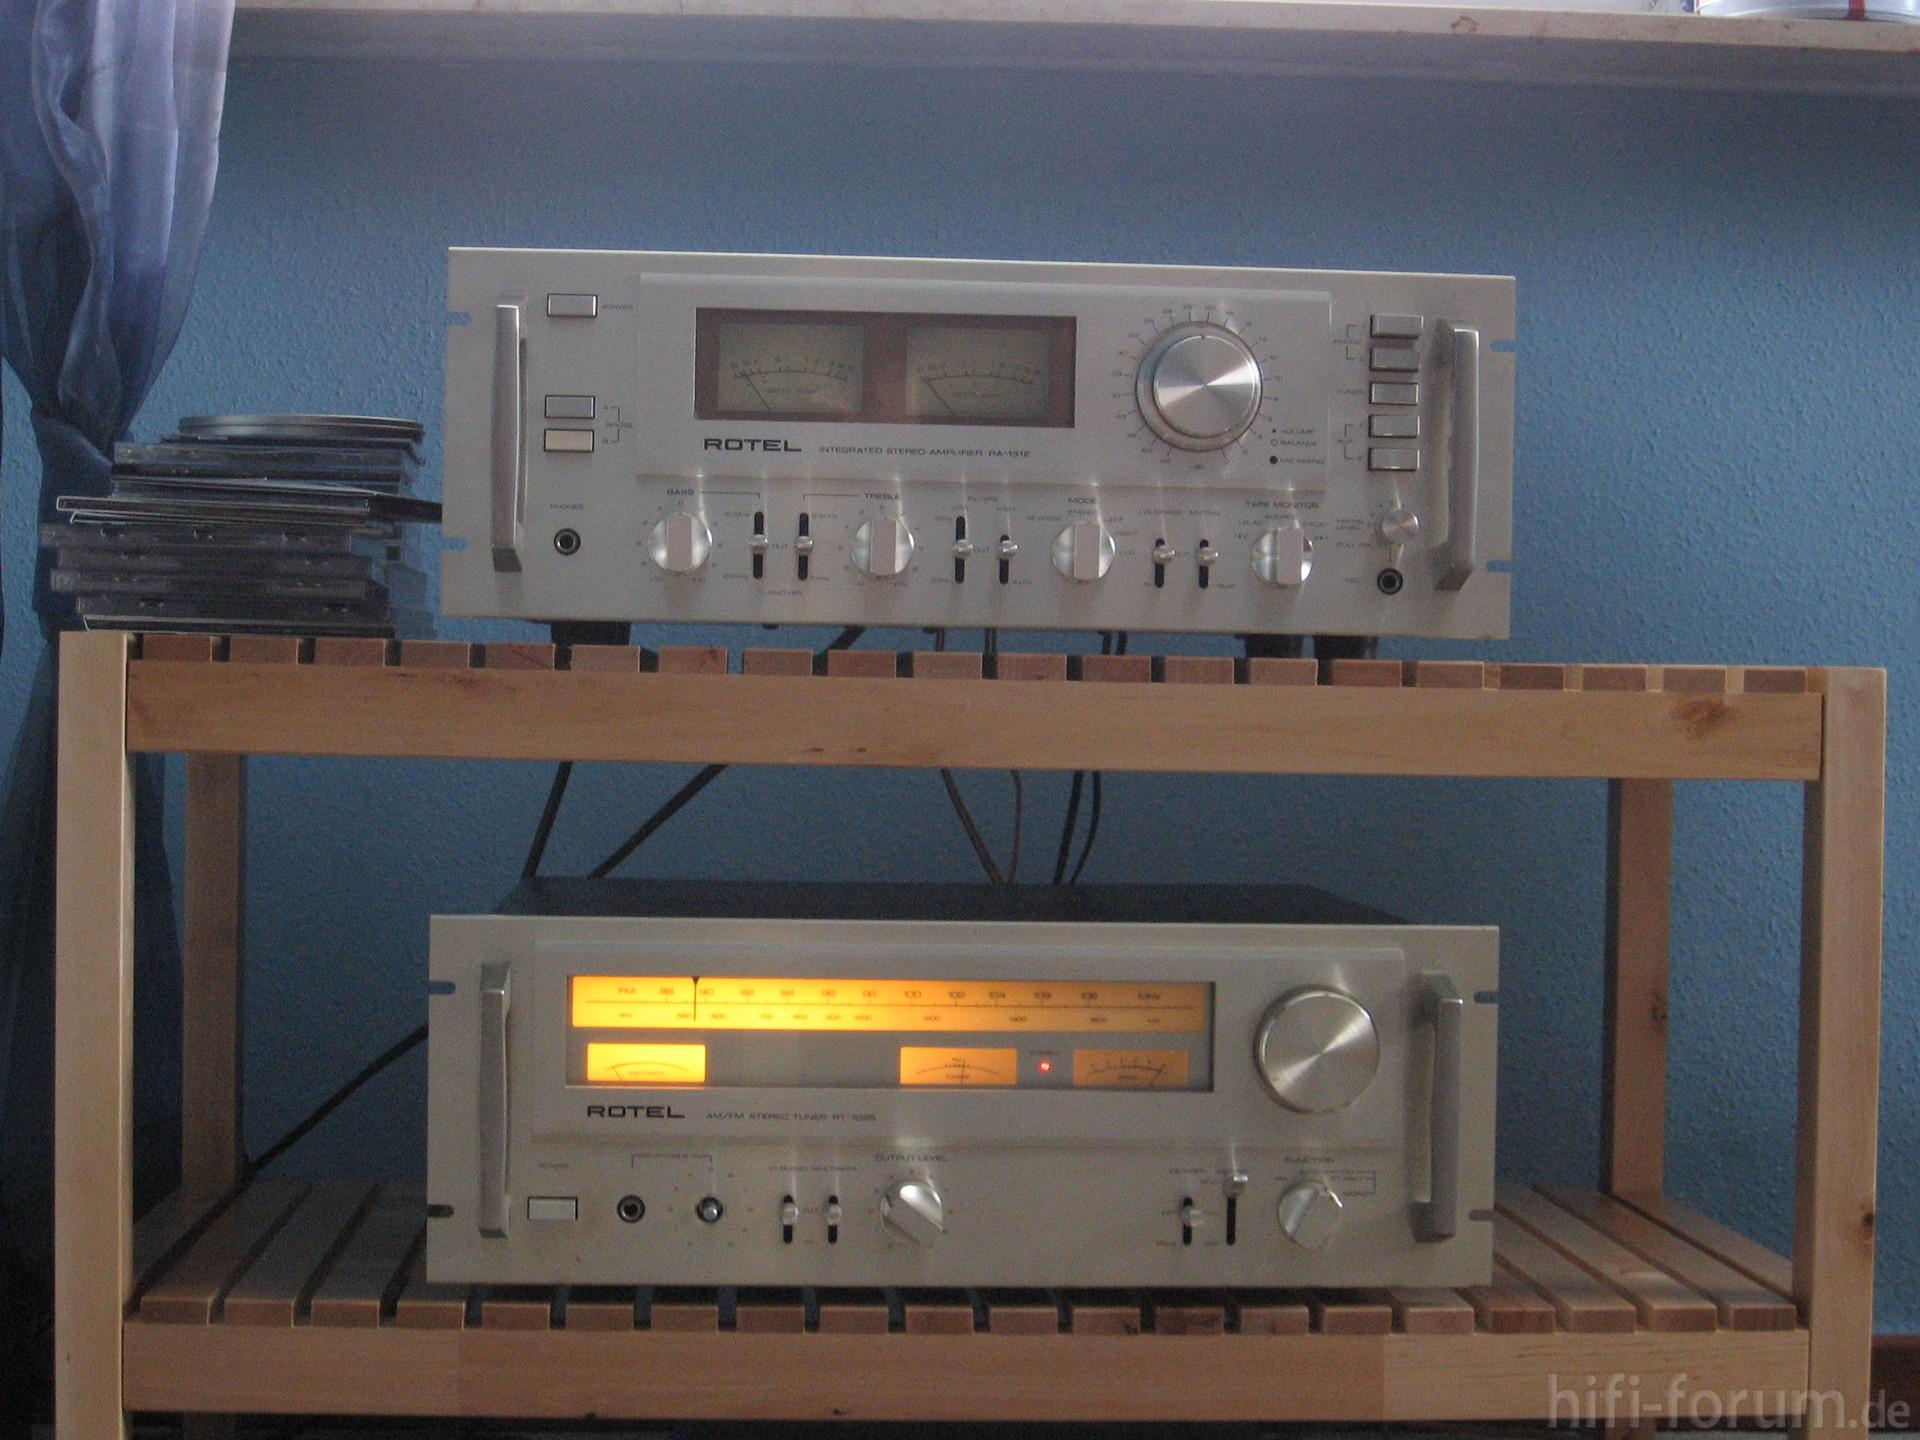 rotel ra 1312 und rt 1025 hifiklassiker ra rotel rt stereo hifi bildergalerie. Black Bedroom Furniture Sets. Home Design Ideas